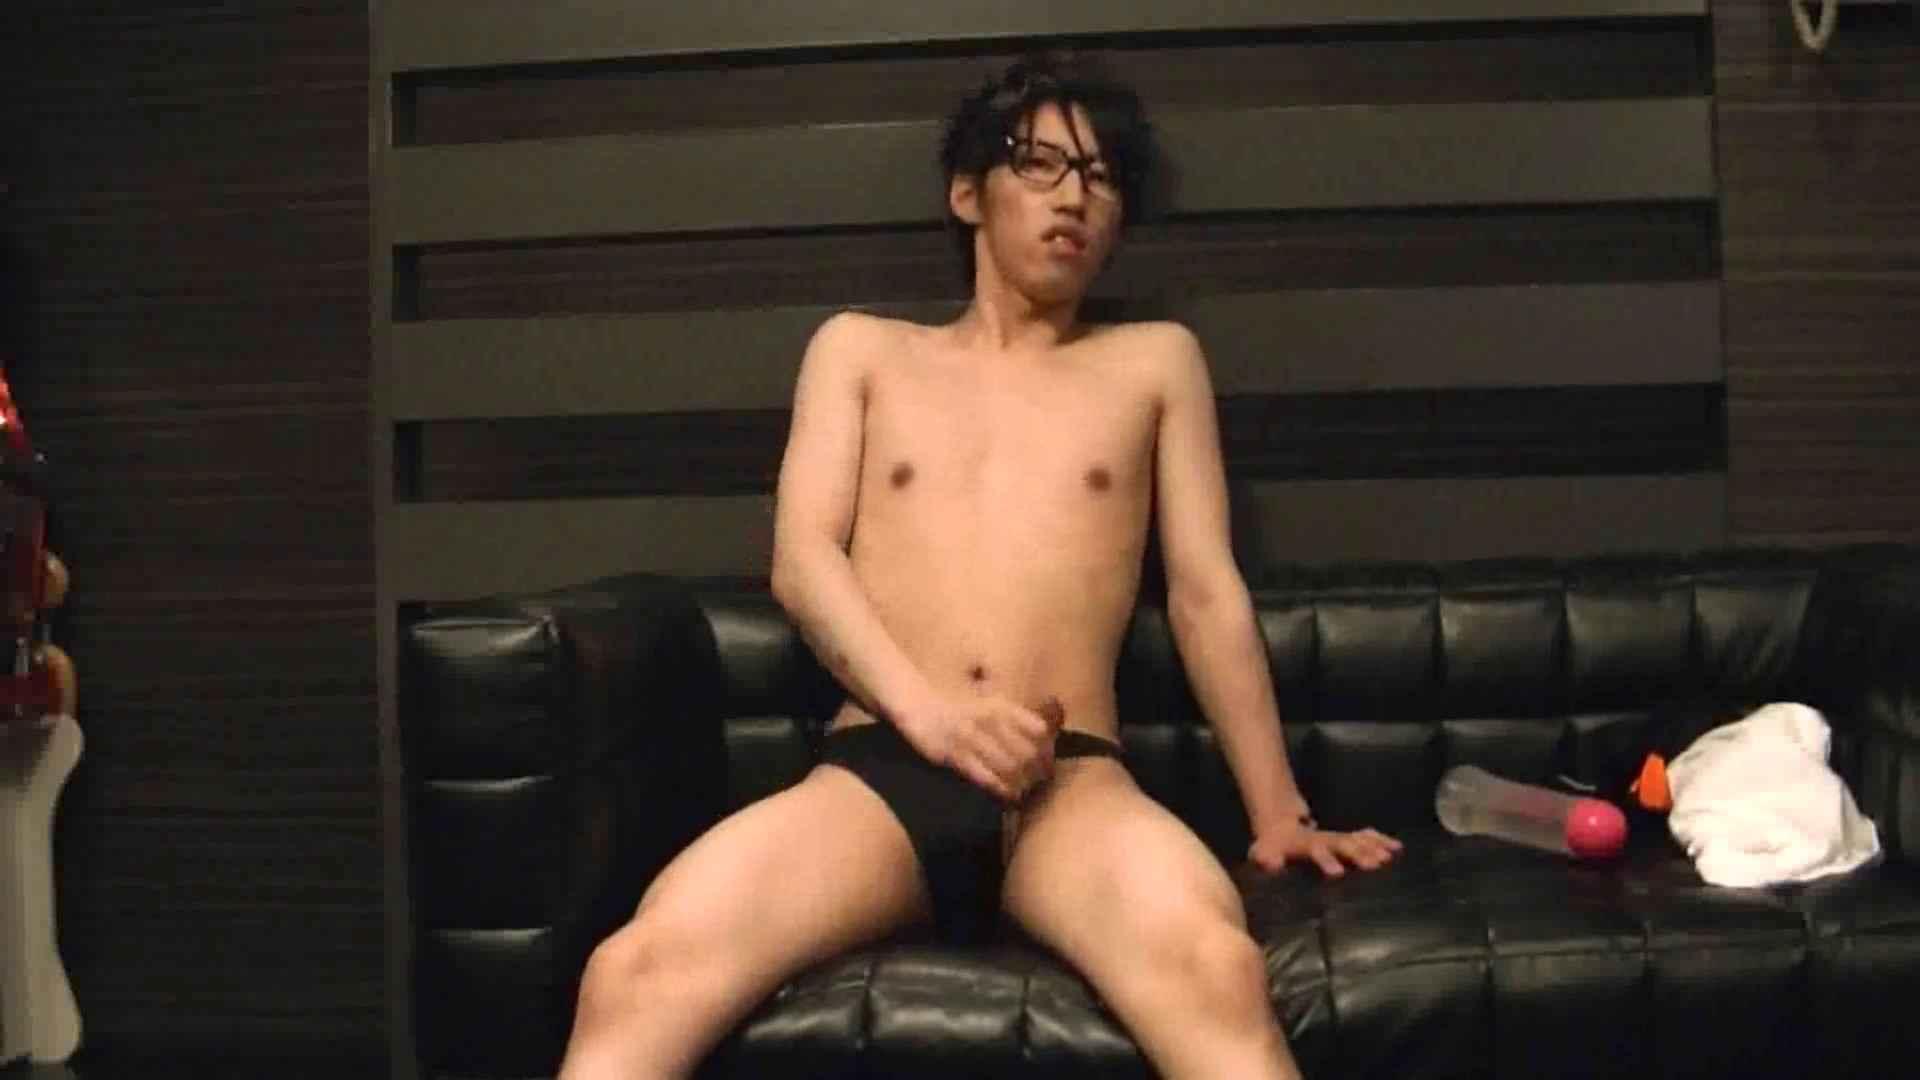 ONA見せカーニバル!! Vol3 男まつり ゲイ無料無修正画像 87枚 55